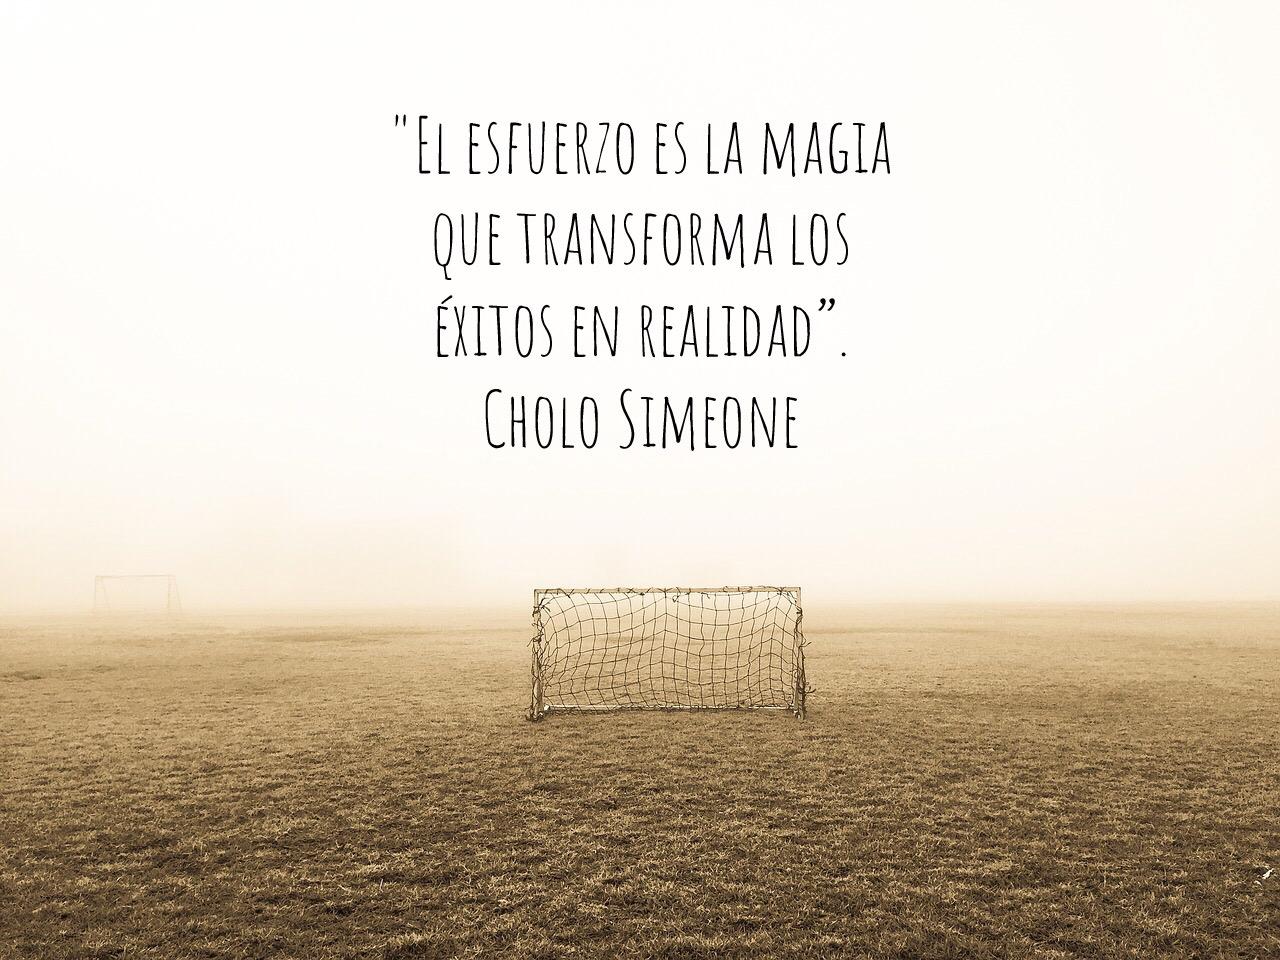 Frases motivadoras para futbolistas lesionados